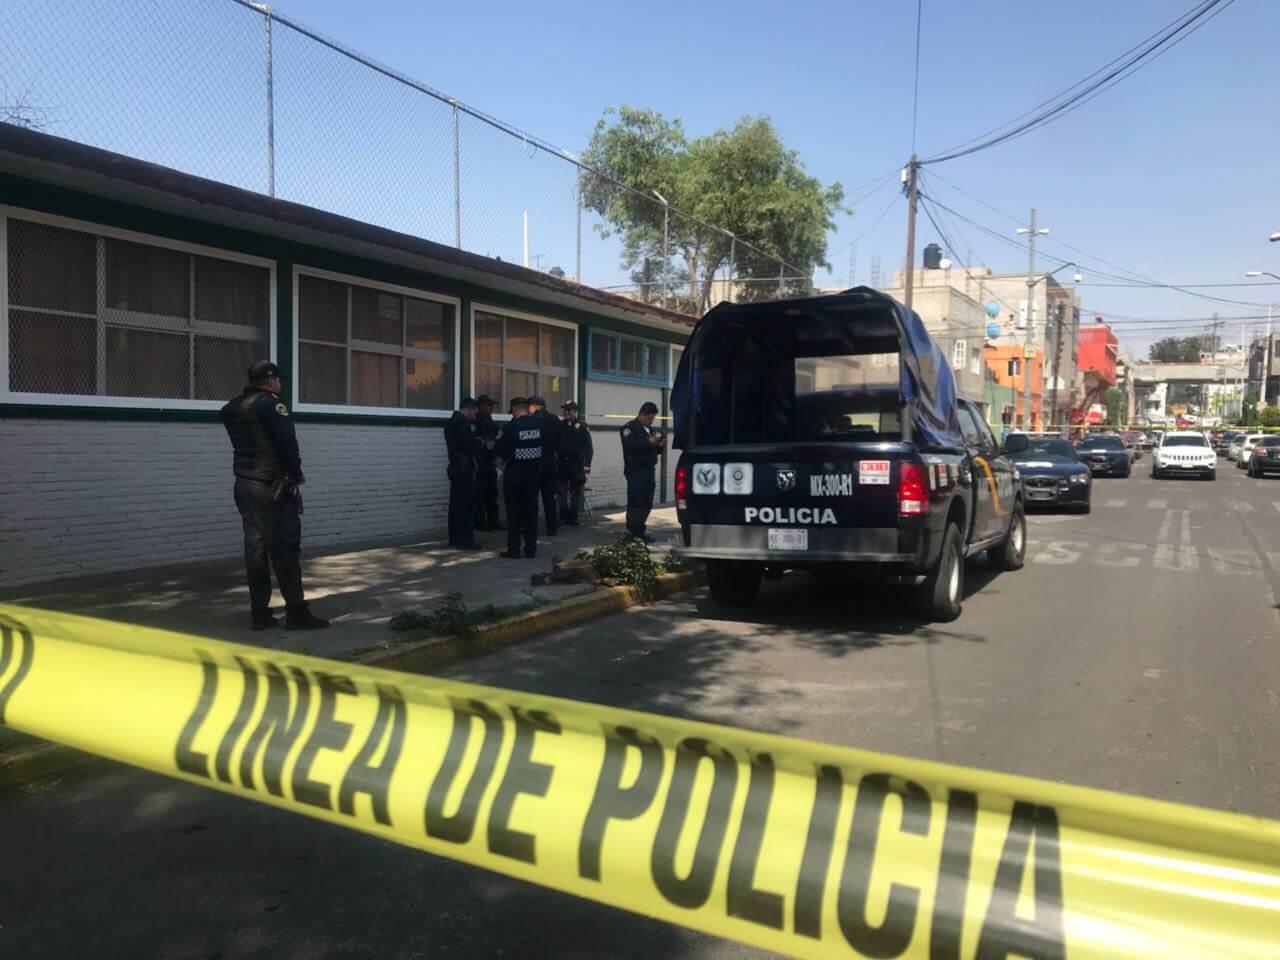 Mueren 3 en tiroteo por presunta venganza en Iztapalapa